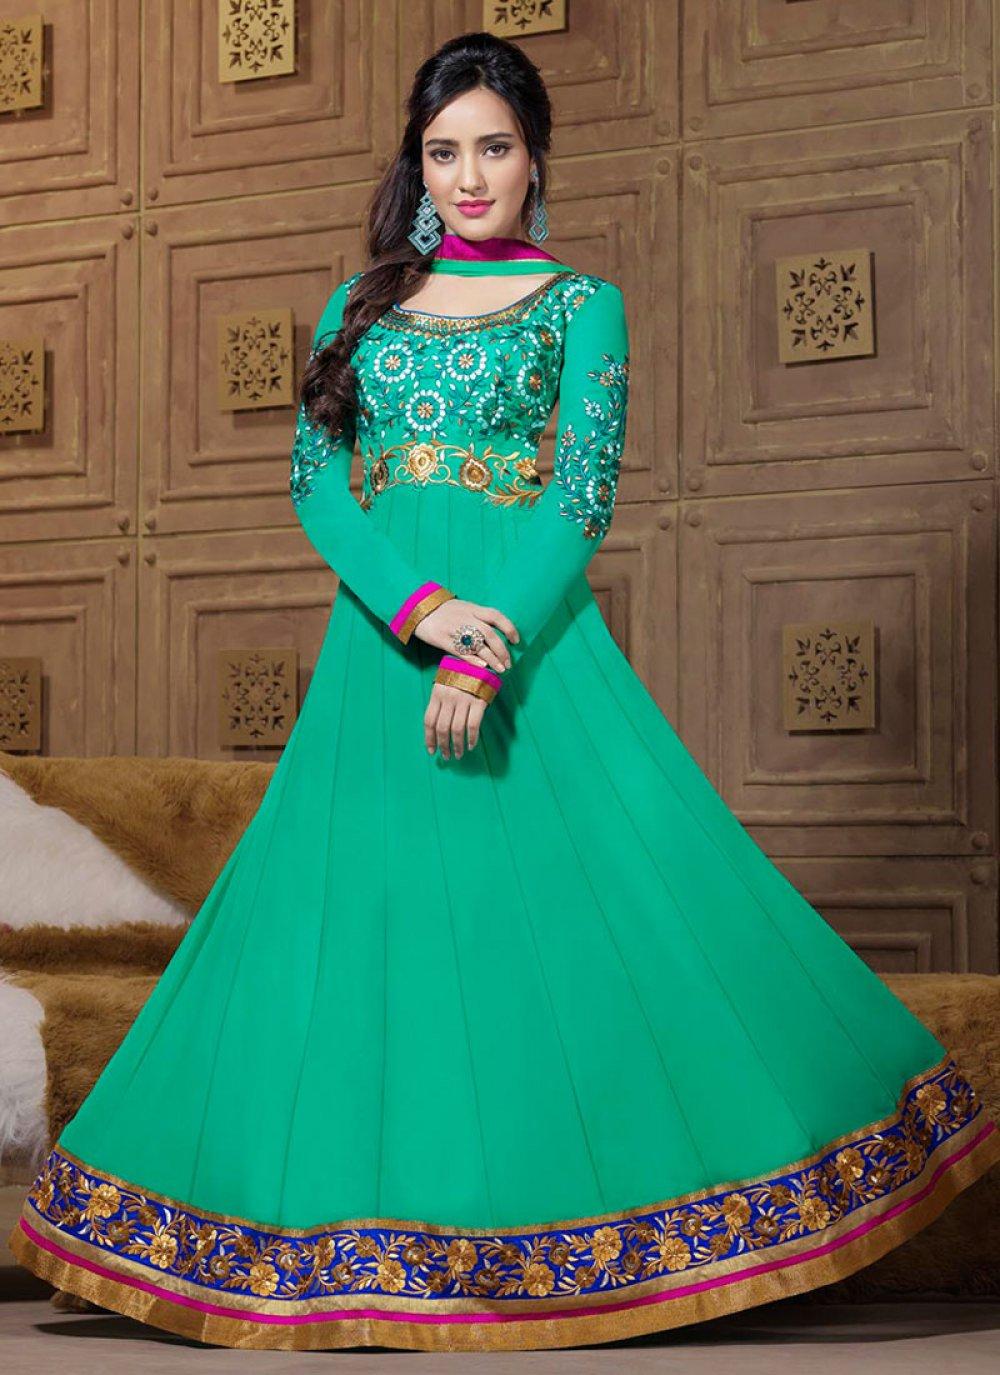 Neha Shrama Turquoise Embroidery Work Anarkali Suit